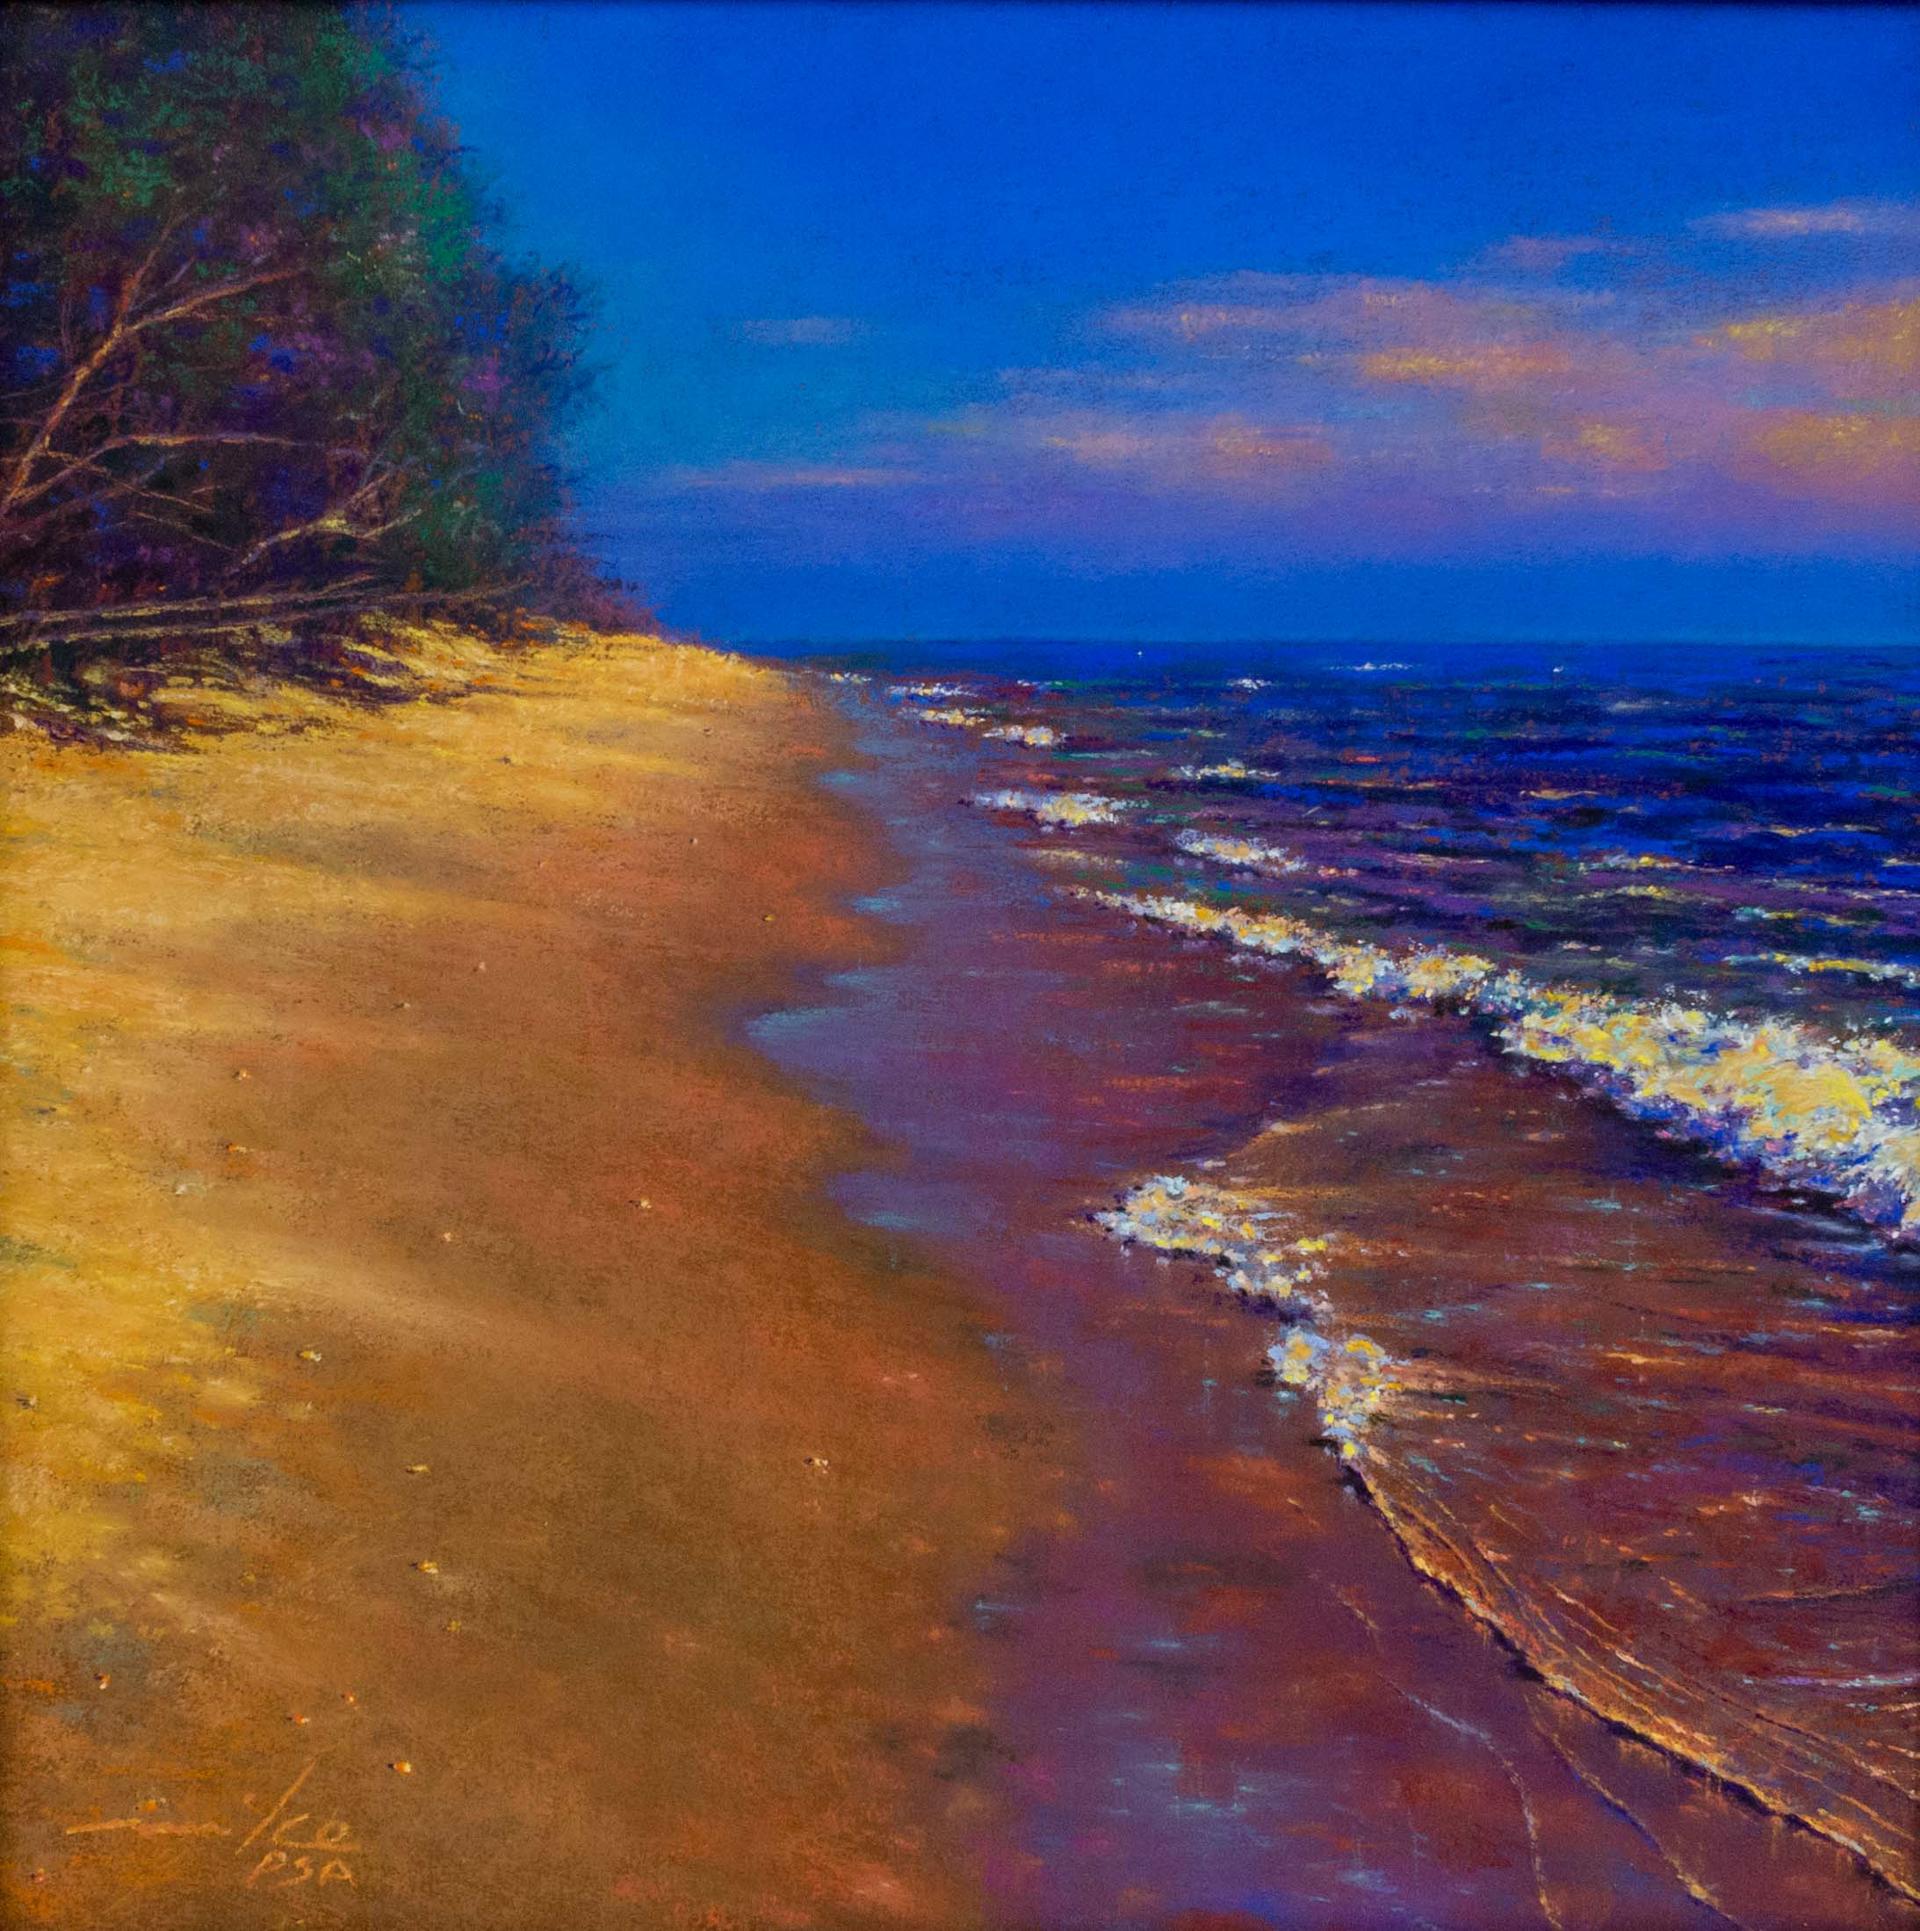 Sun On A Beach by Mike Barret Kolasinski